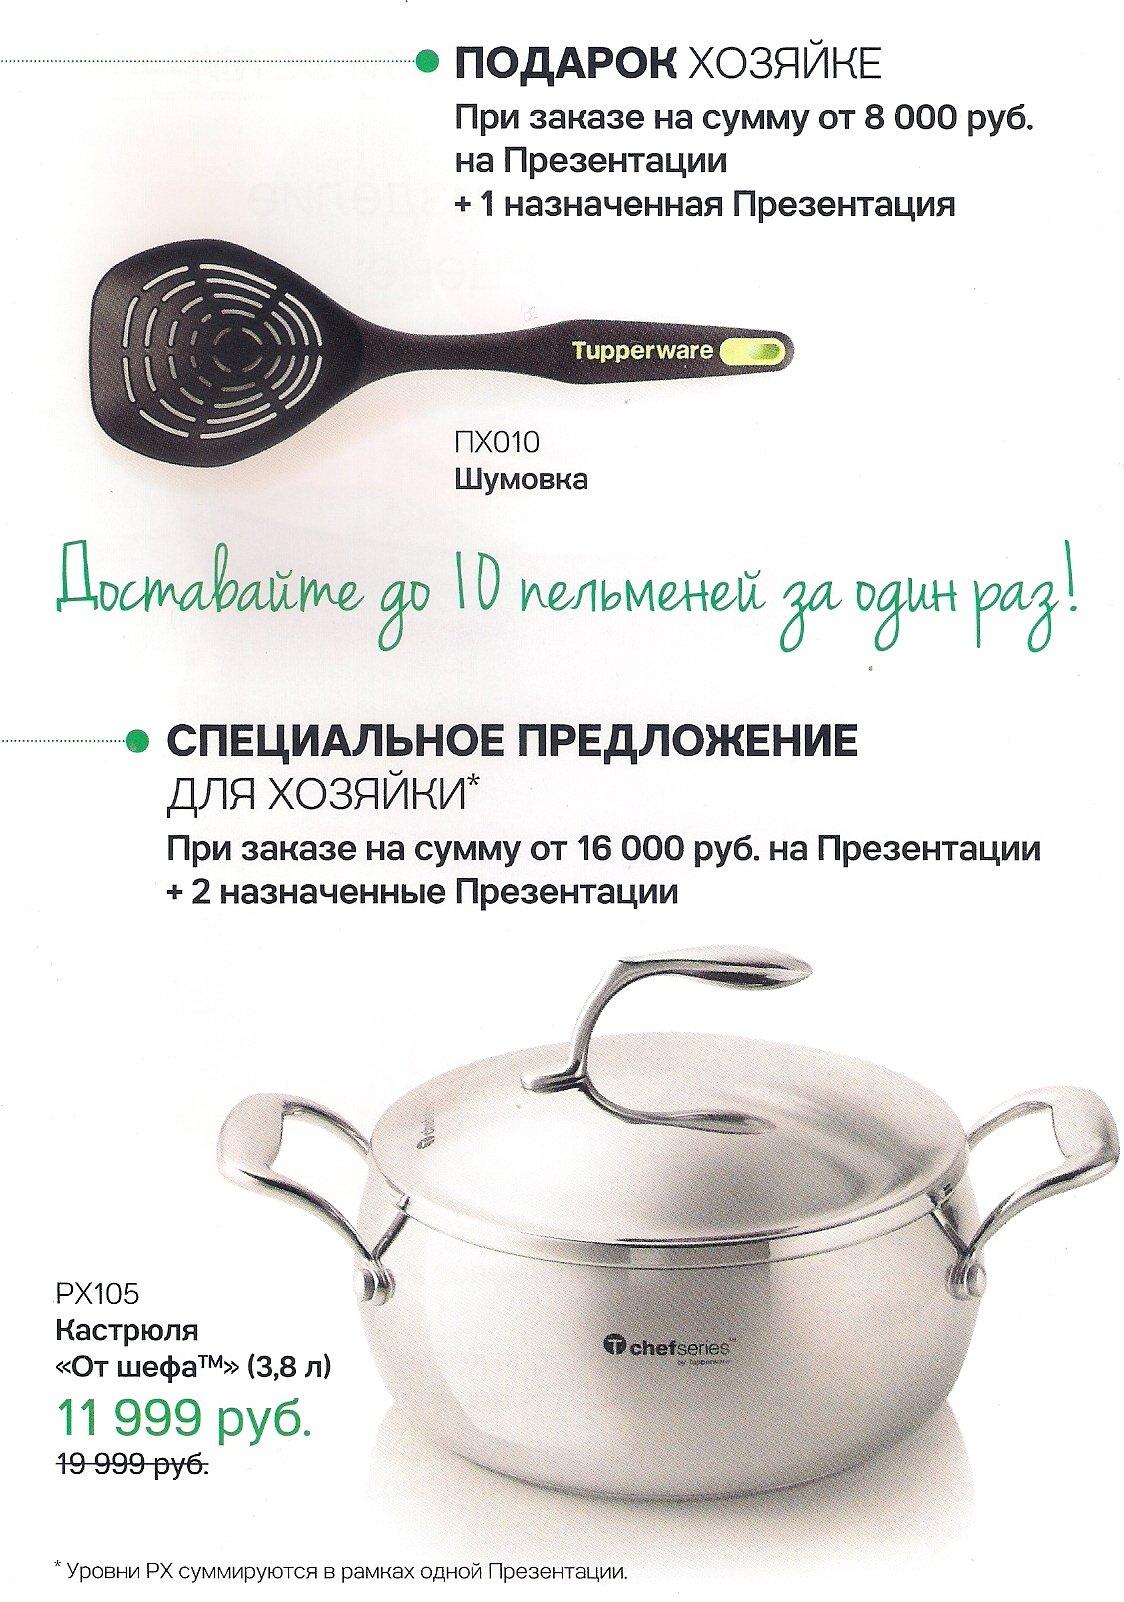 https://tupperware-online.ru/images/upload/2d.jpg